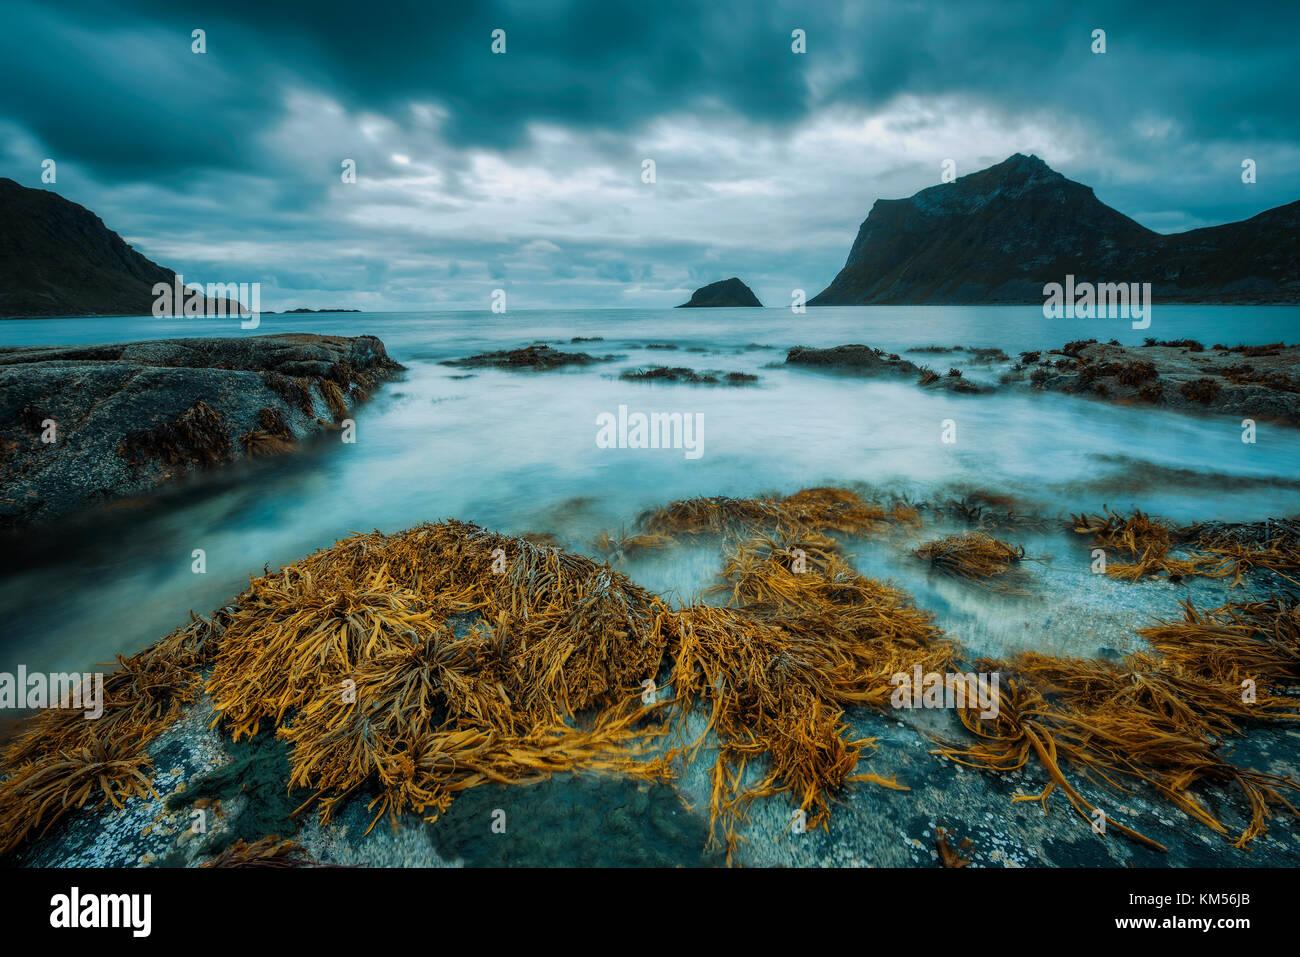 Haukland spiaggia su isole Lofoten in Norvegia Immagini Stock